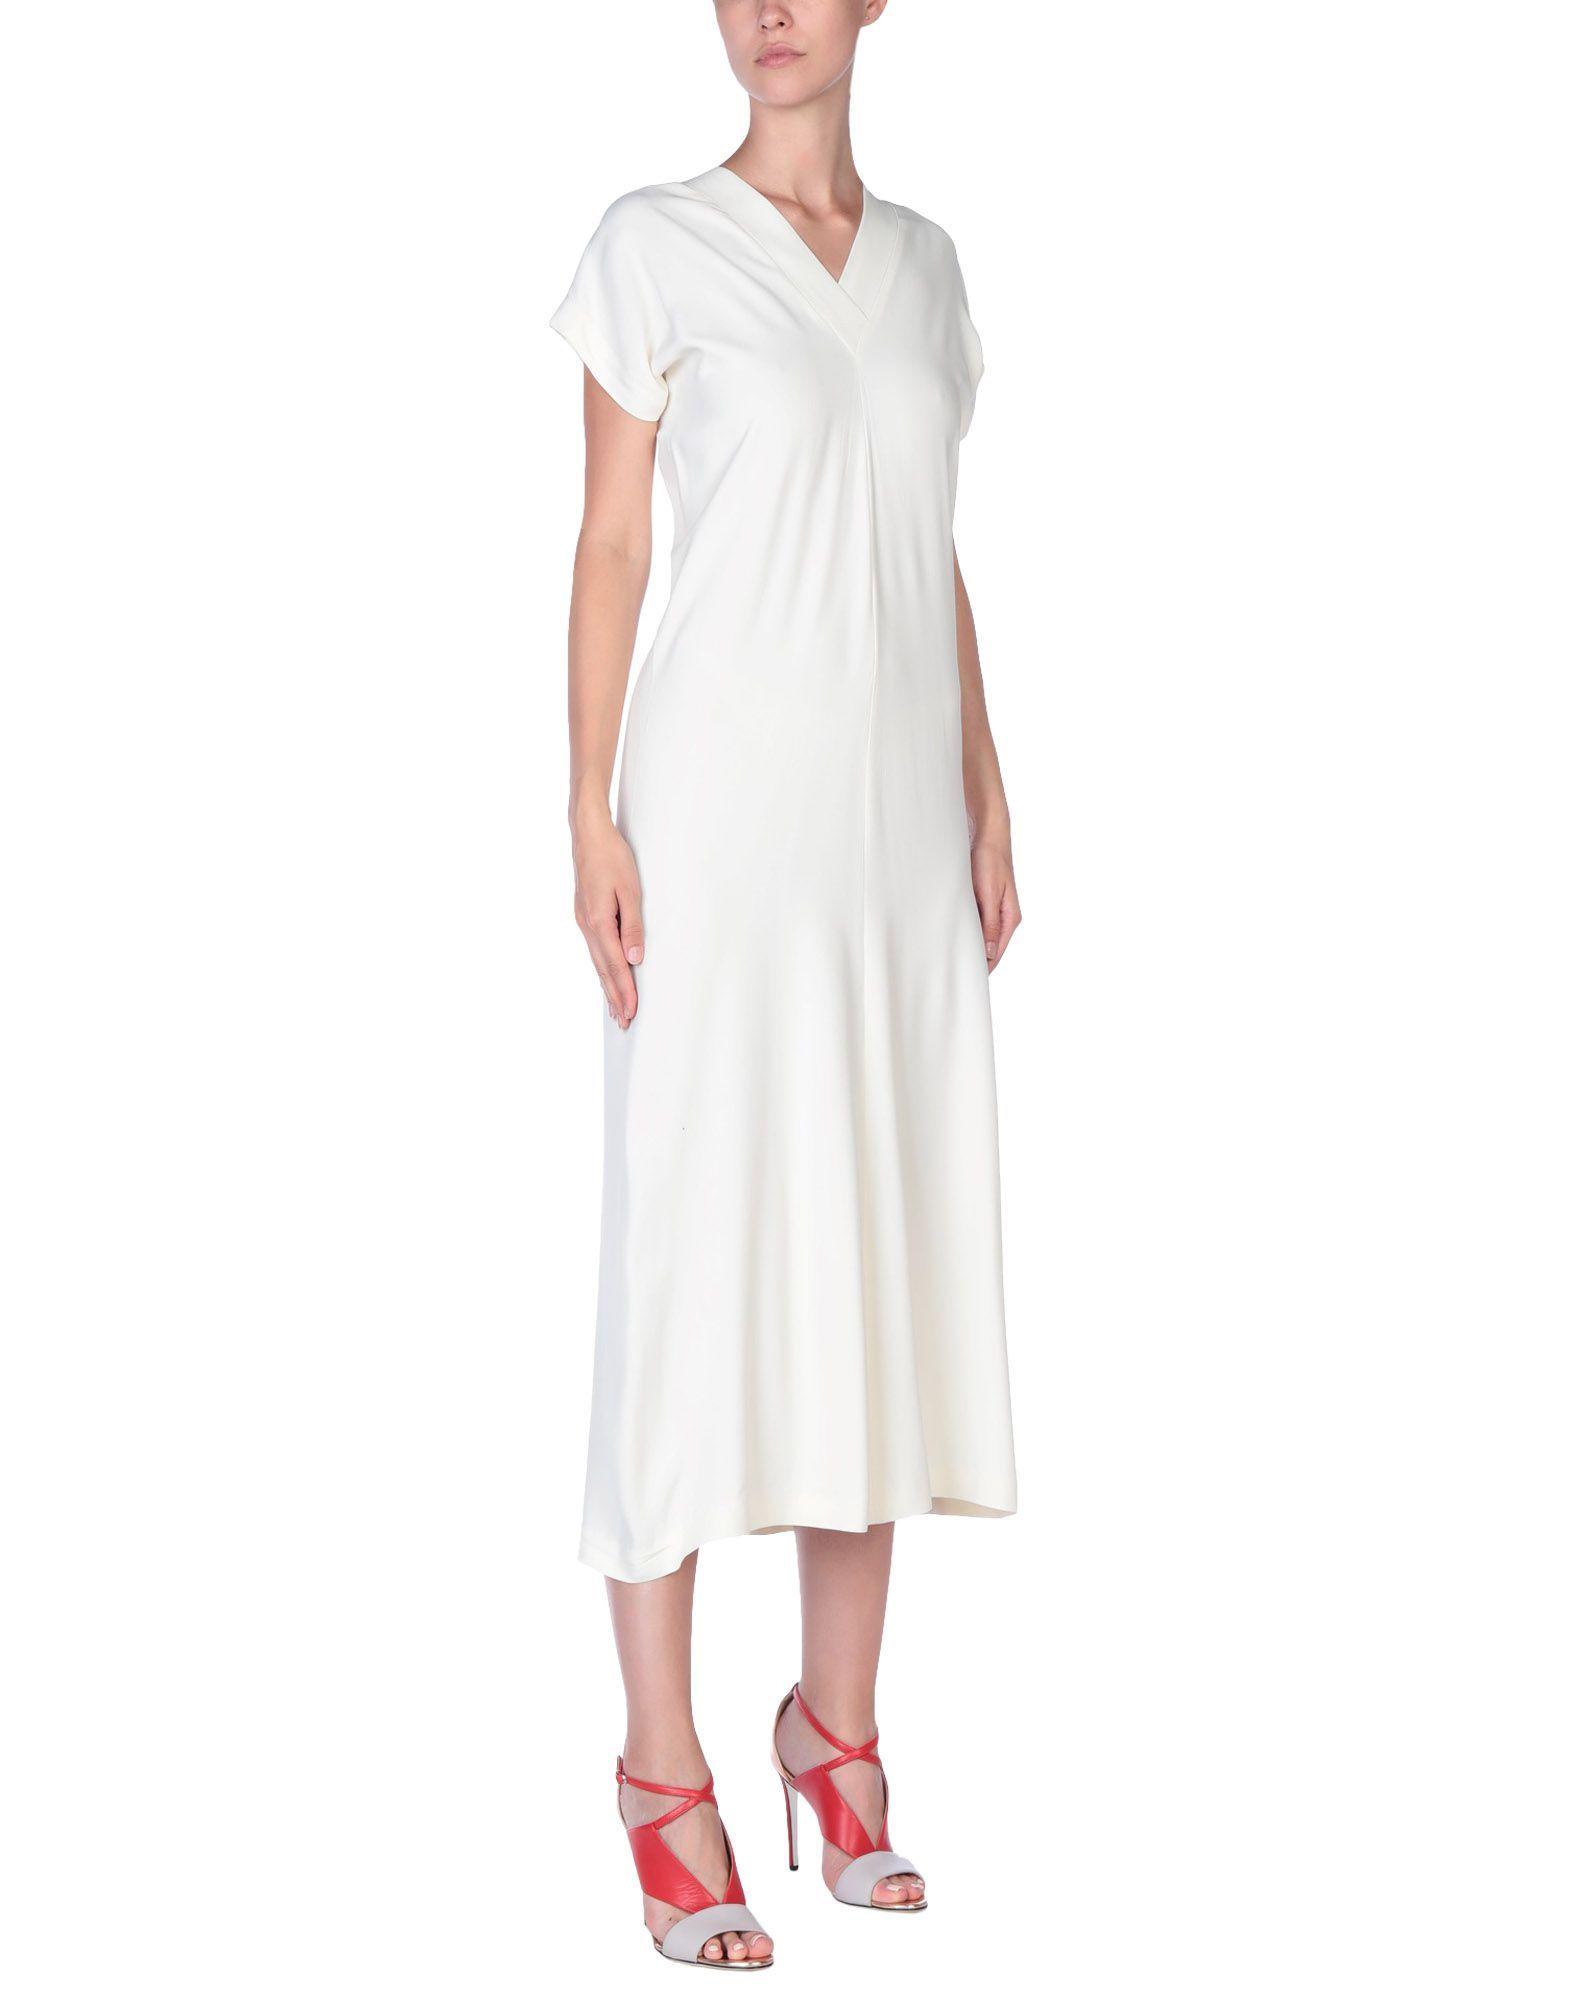 Helmut Lang Ivory Crepe Short Sleeve Dress